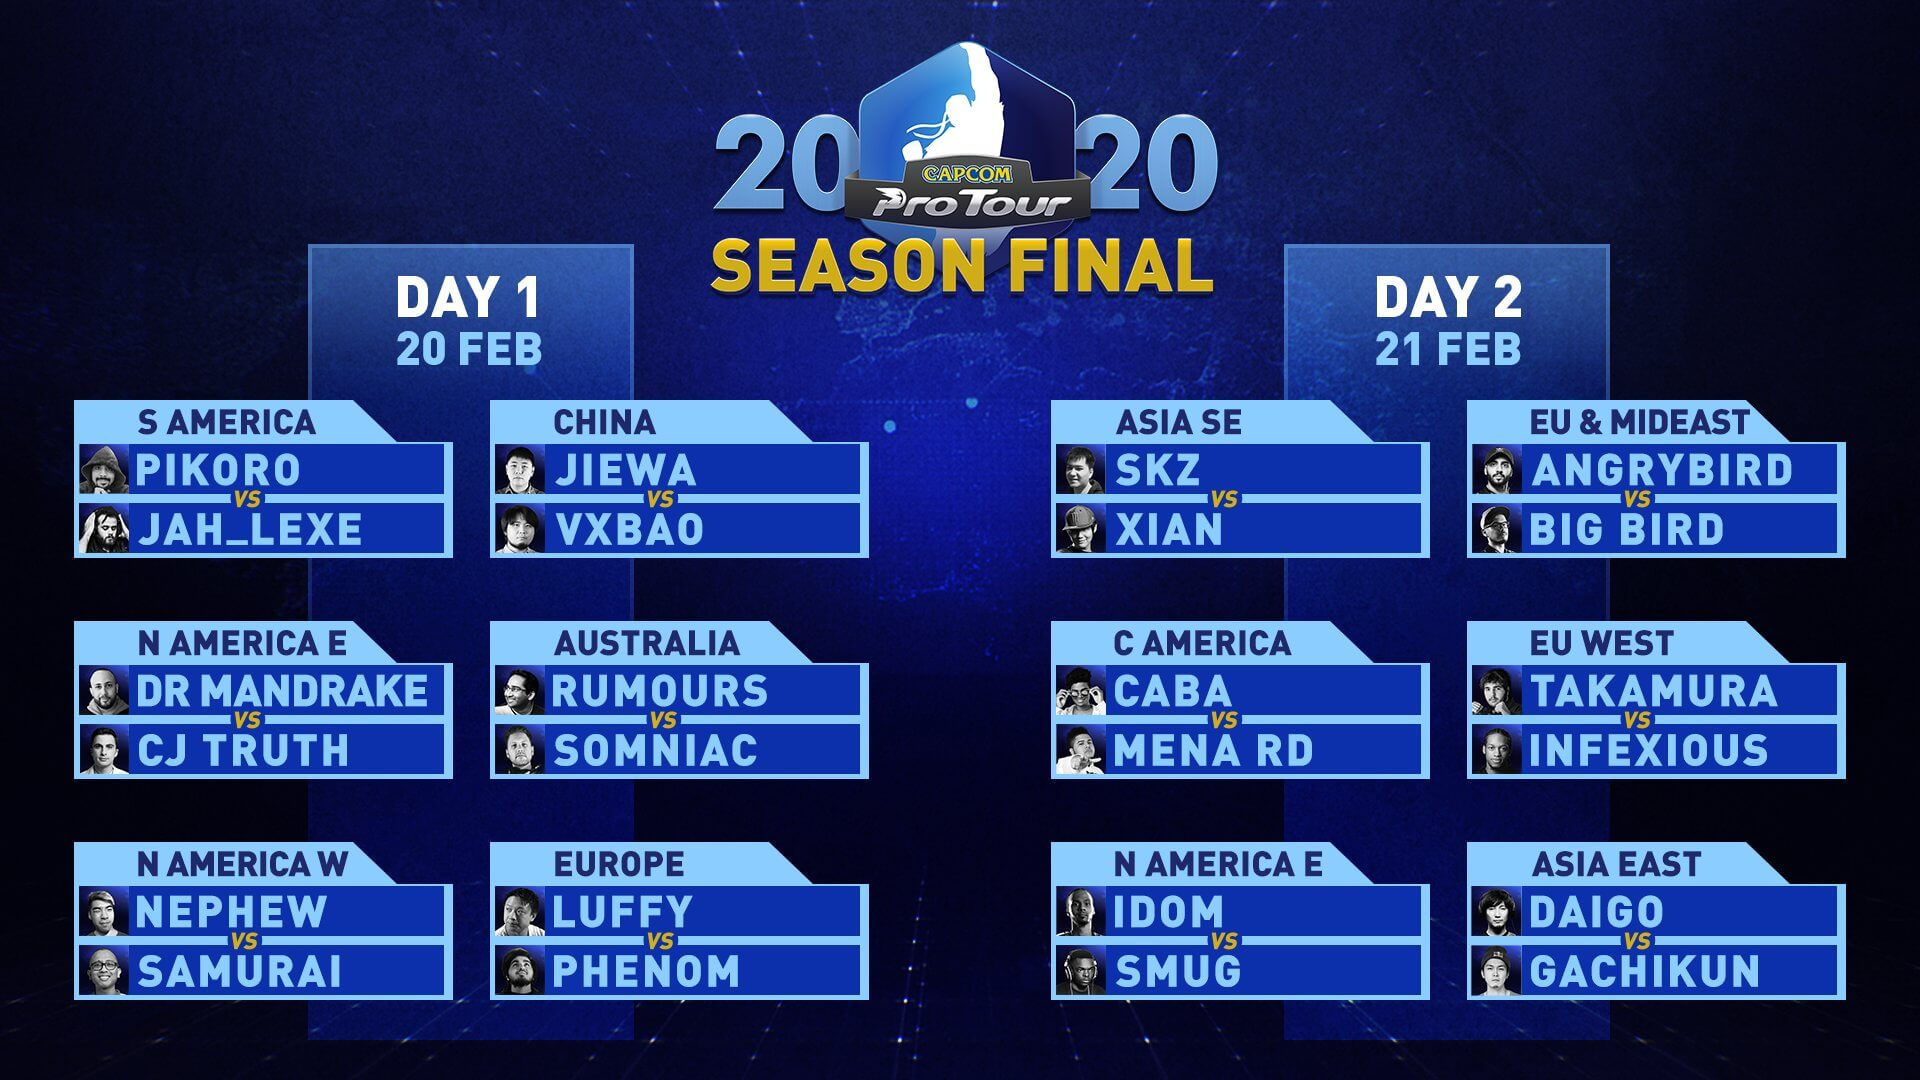 Capcom Pro Tour 2020 Season Final, Street Fighter V esports - all the matches